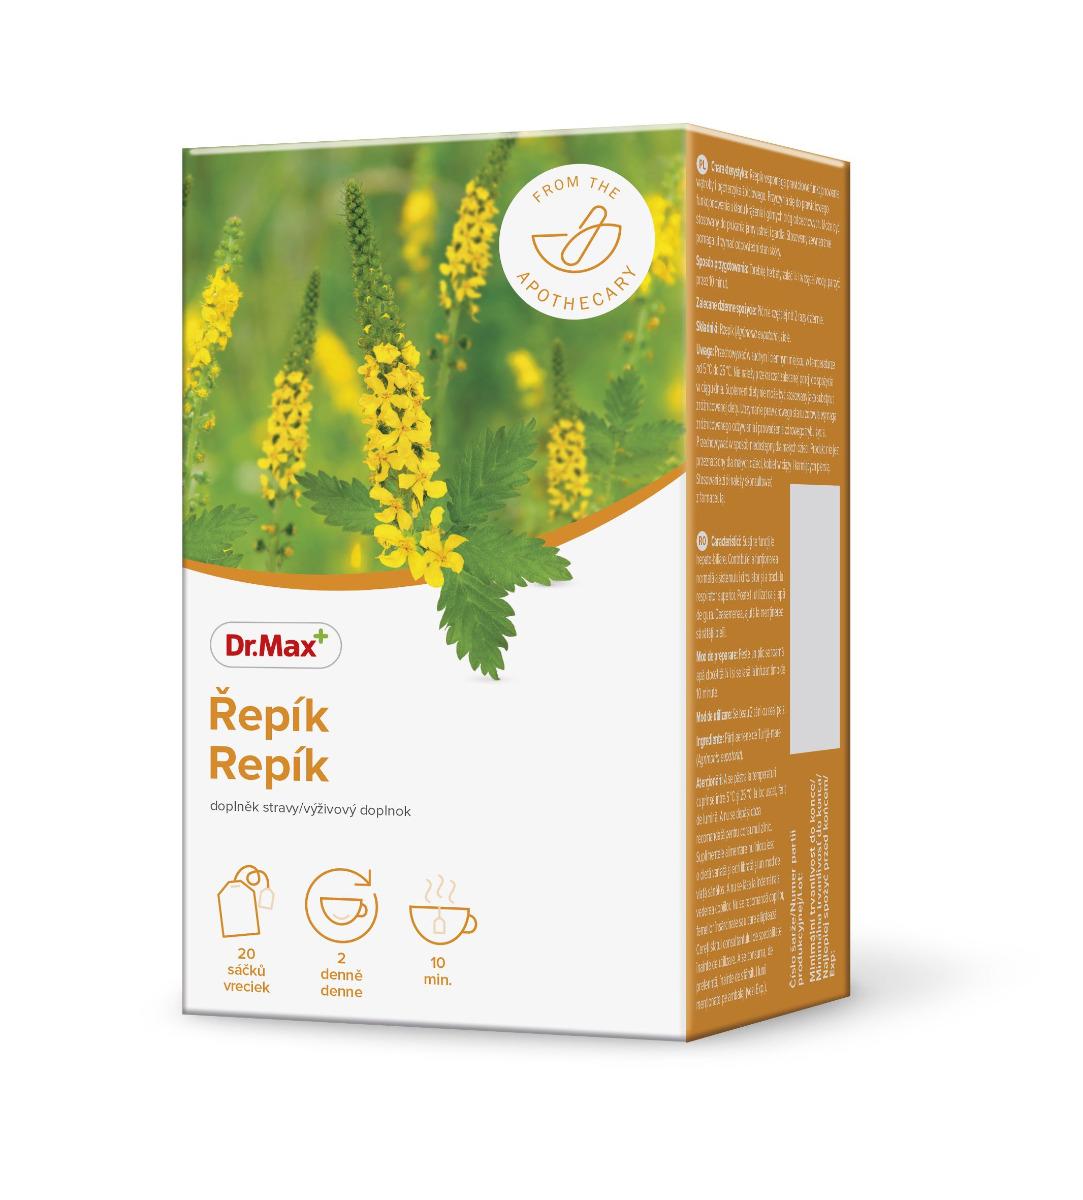 Dr.Max Řepík bylinný čaj 20x1,5 g